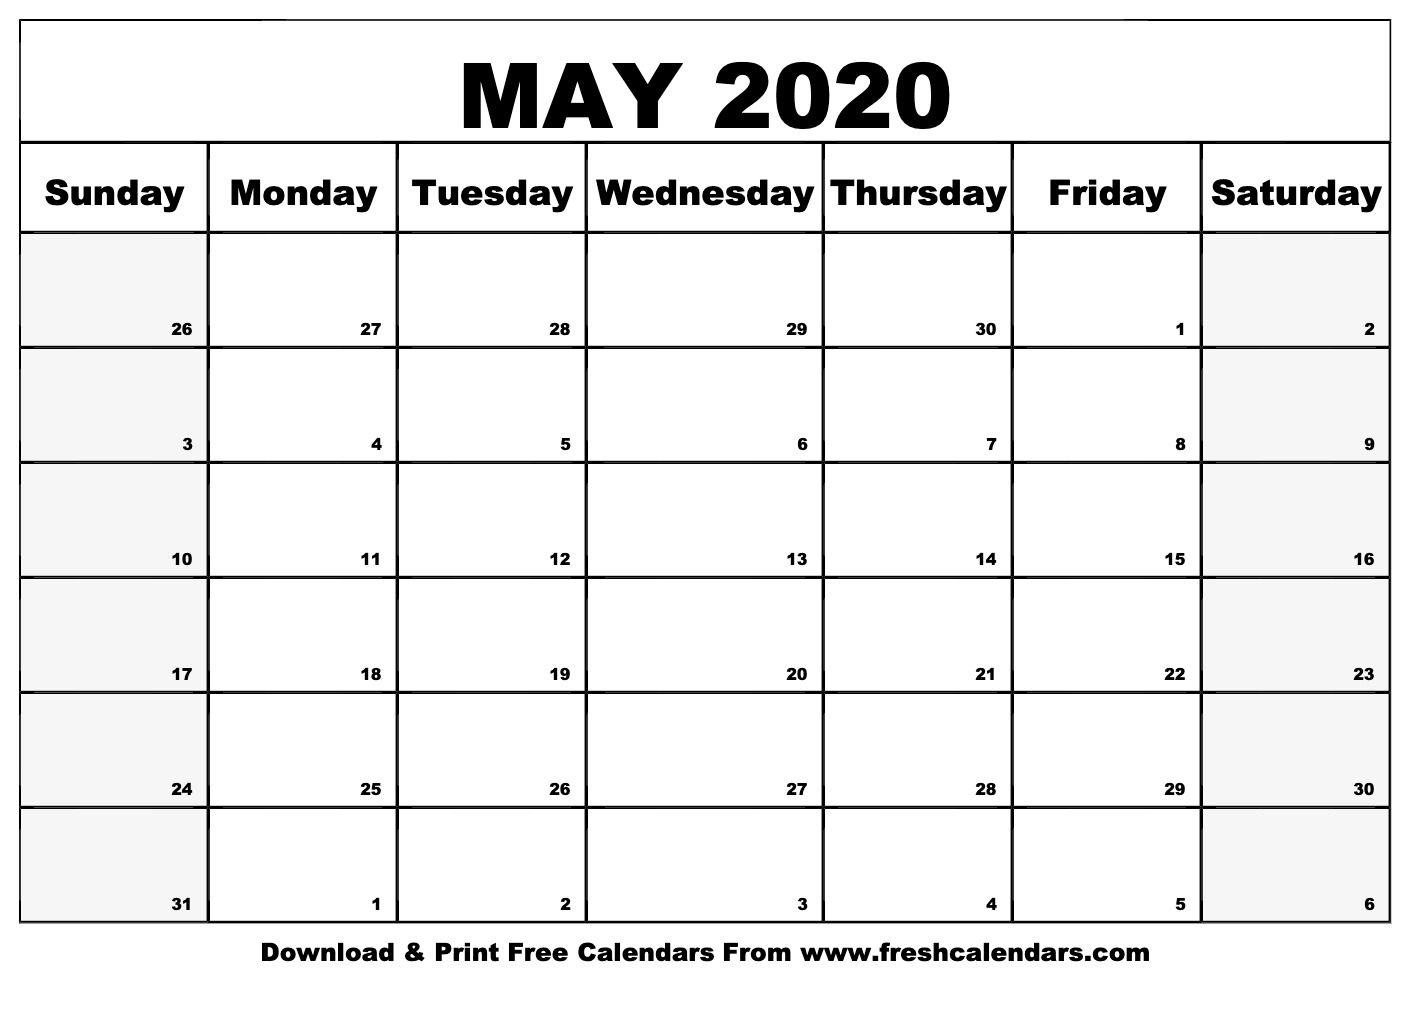 Universal Blank 30 Day Calendar Starting May 24 | Get Your Calendar Printable